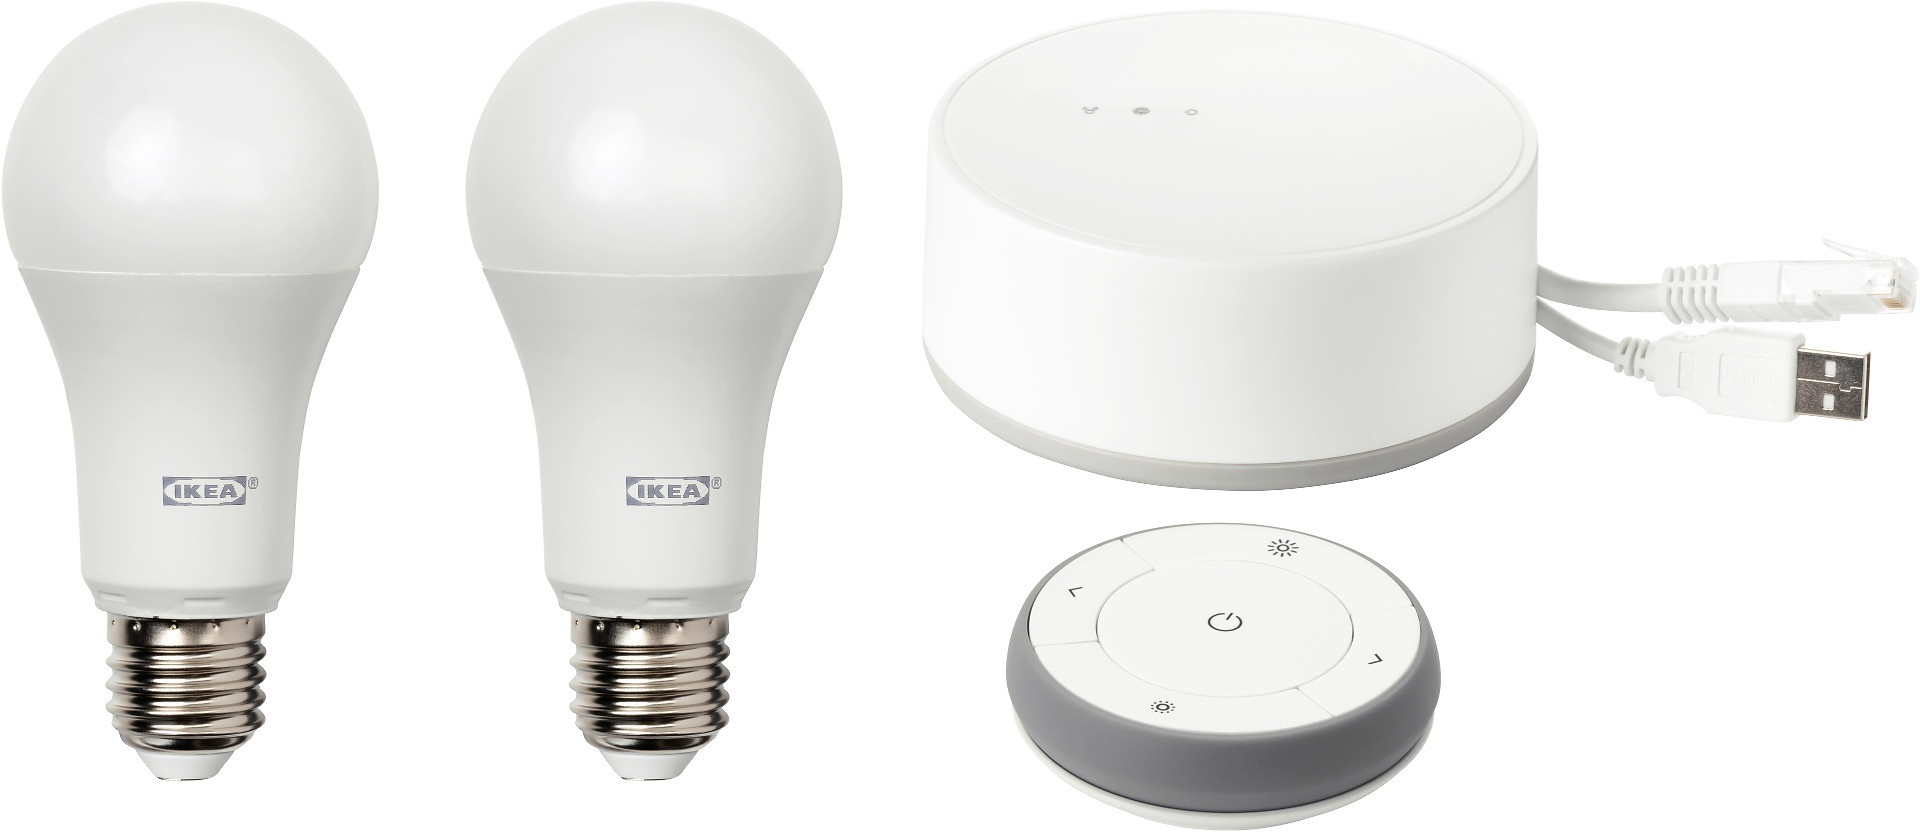 Ikea TRÅDFRI E27 LED 980lm, Set van 2 lampen met verbindingshub ...